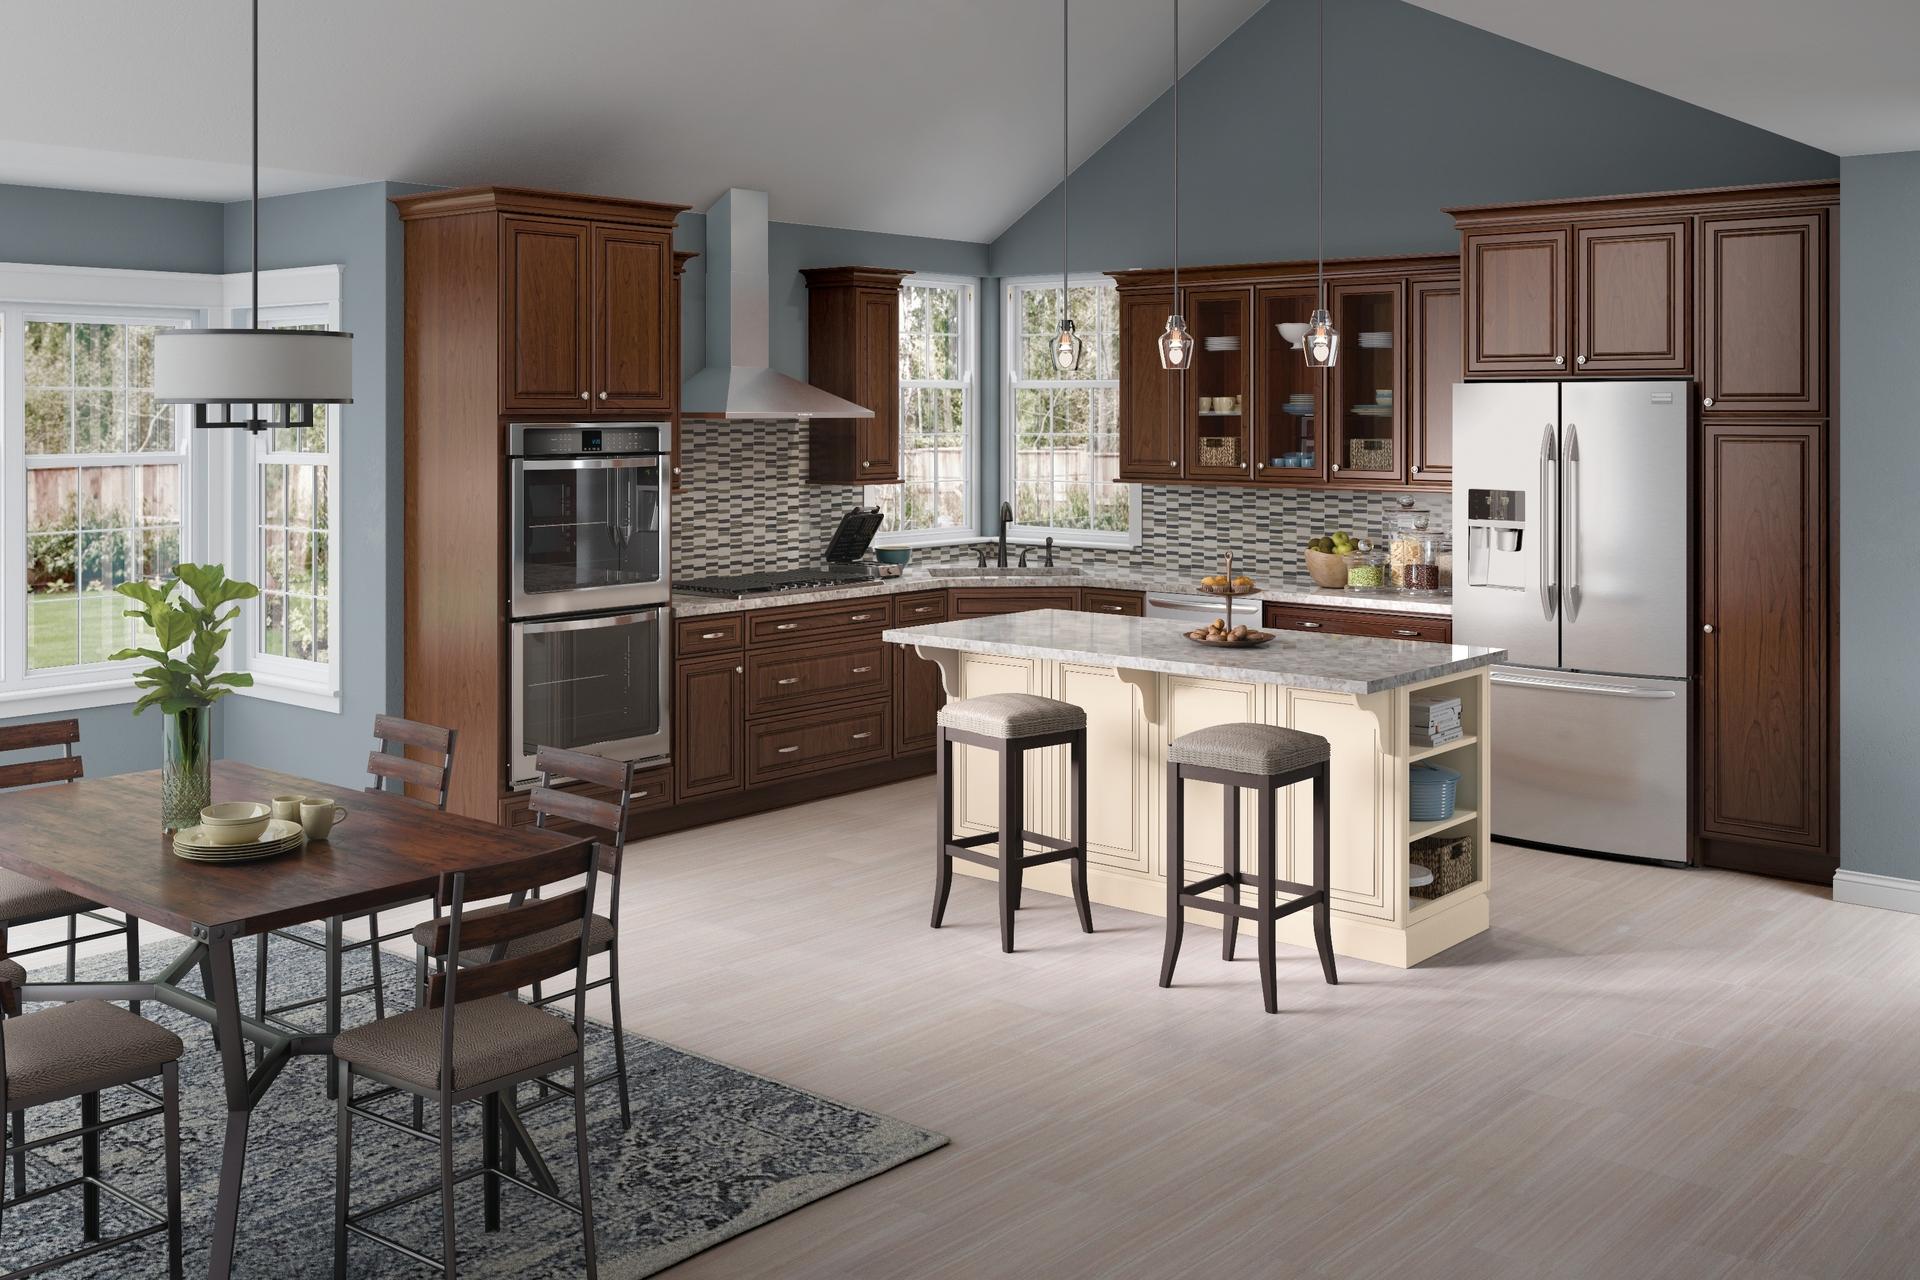 aj kitchen design. Colfax Cherry Chocolate With Ebony Glaze And Maple Canvas Cocoa Cardell Kitchen Cabinets  In